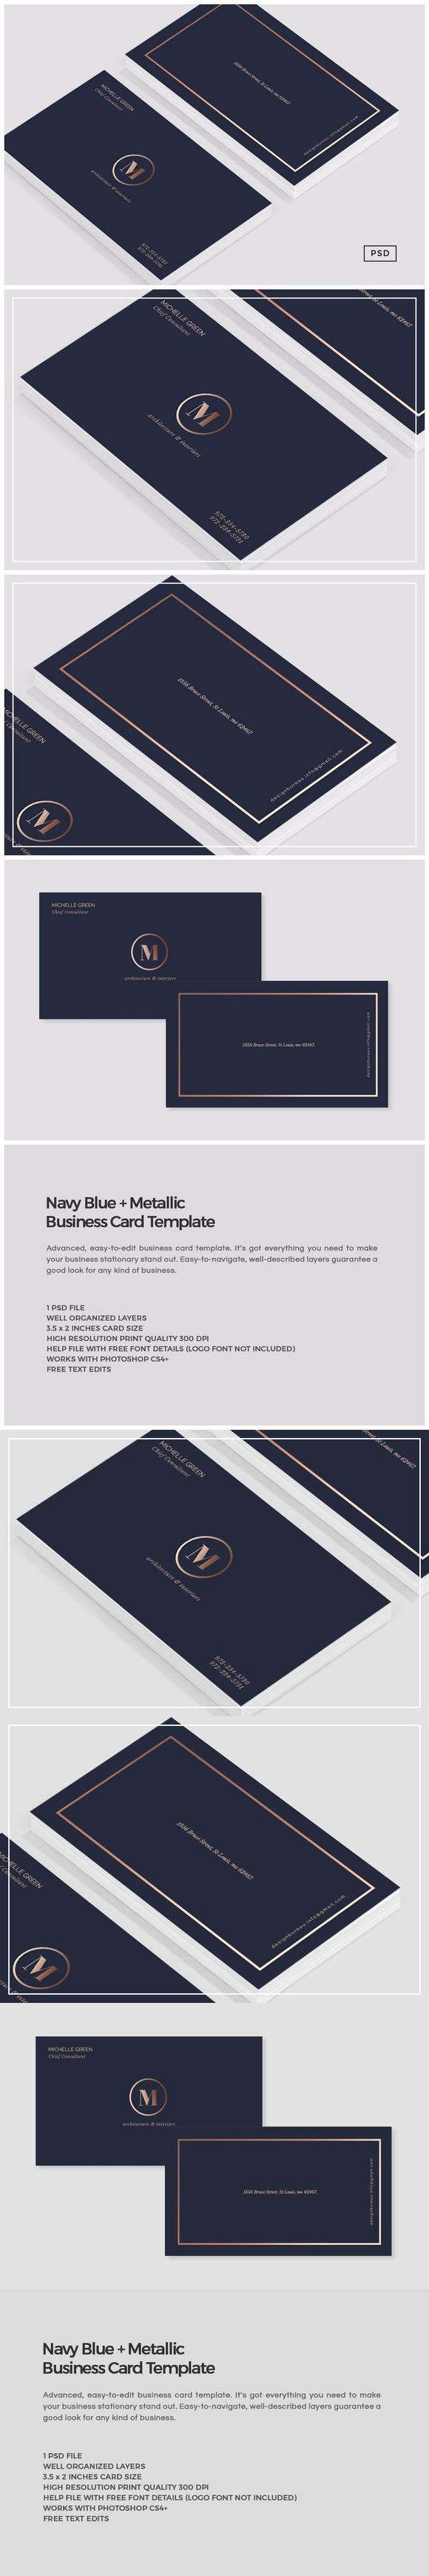 Navy Blue Metallic Business Card Formal Business Card Business Cards Creative Templates Business Card Template